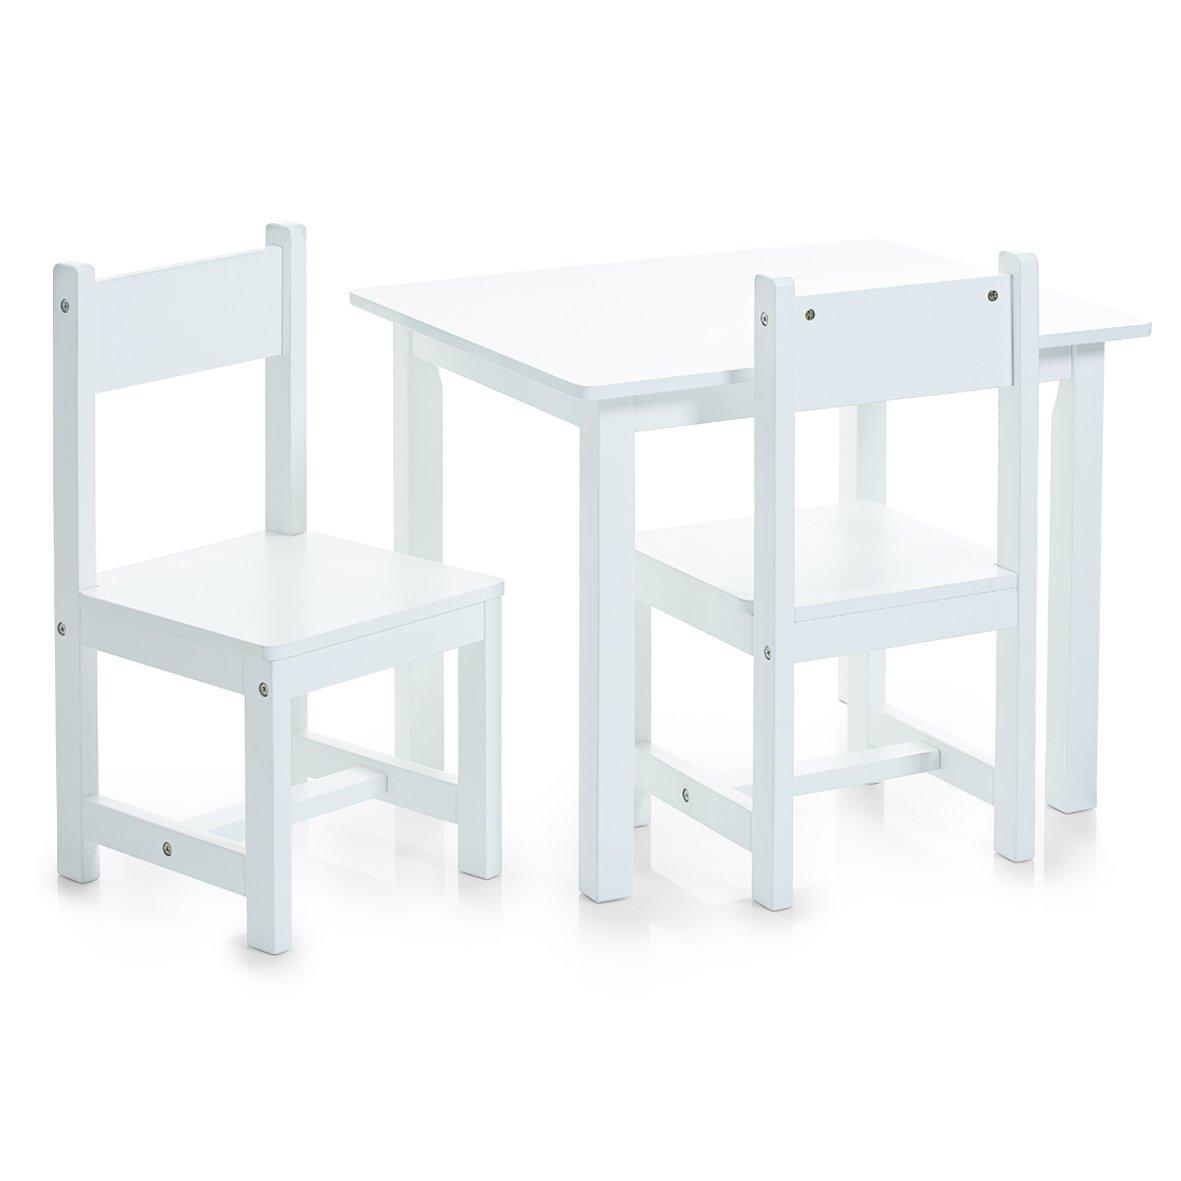 Zeller, Set di tavolino e sedie per bambini, 3 pz, Bianco (Weiß), dimensioni tavolo: 59 x 47 x 45 cm, dimensioni sedie: 28 x 28 x 51,5 cm 13450